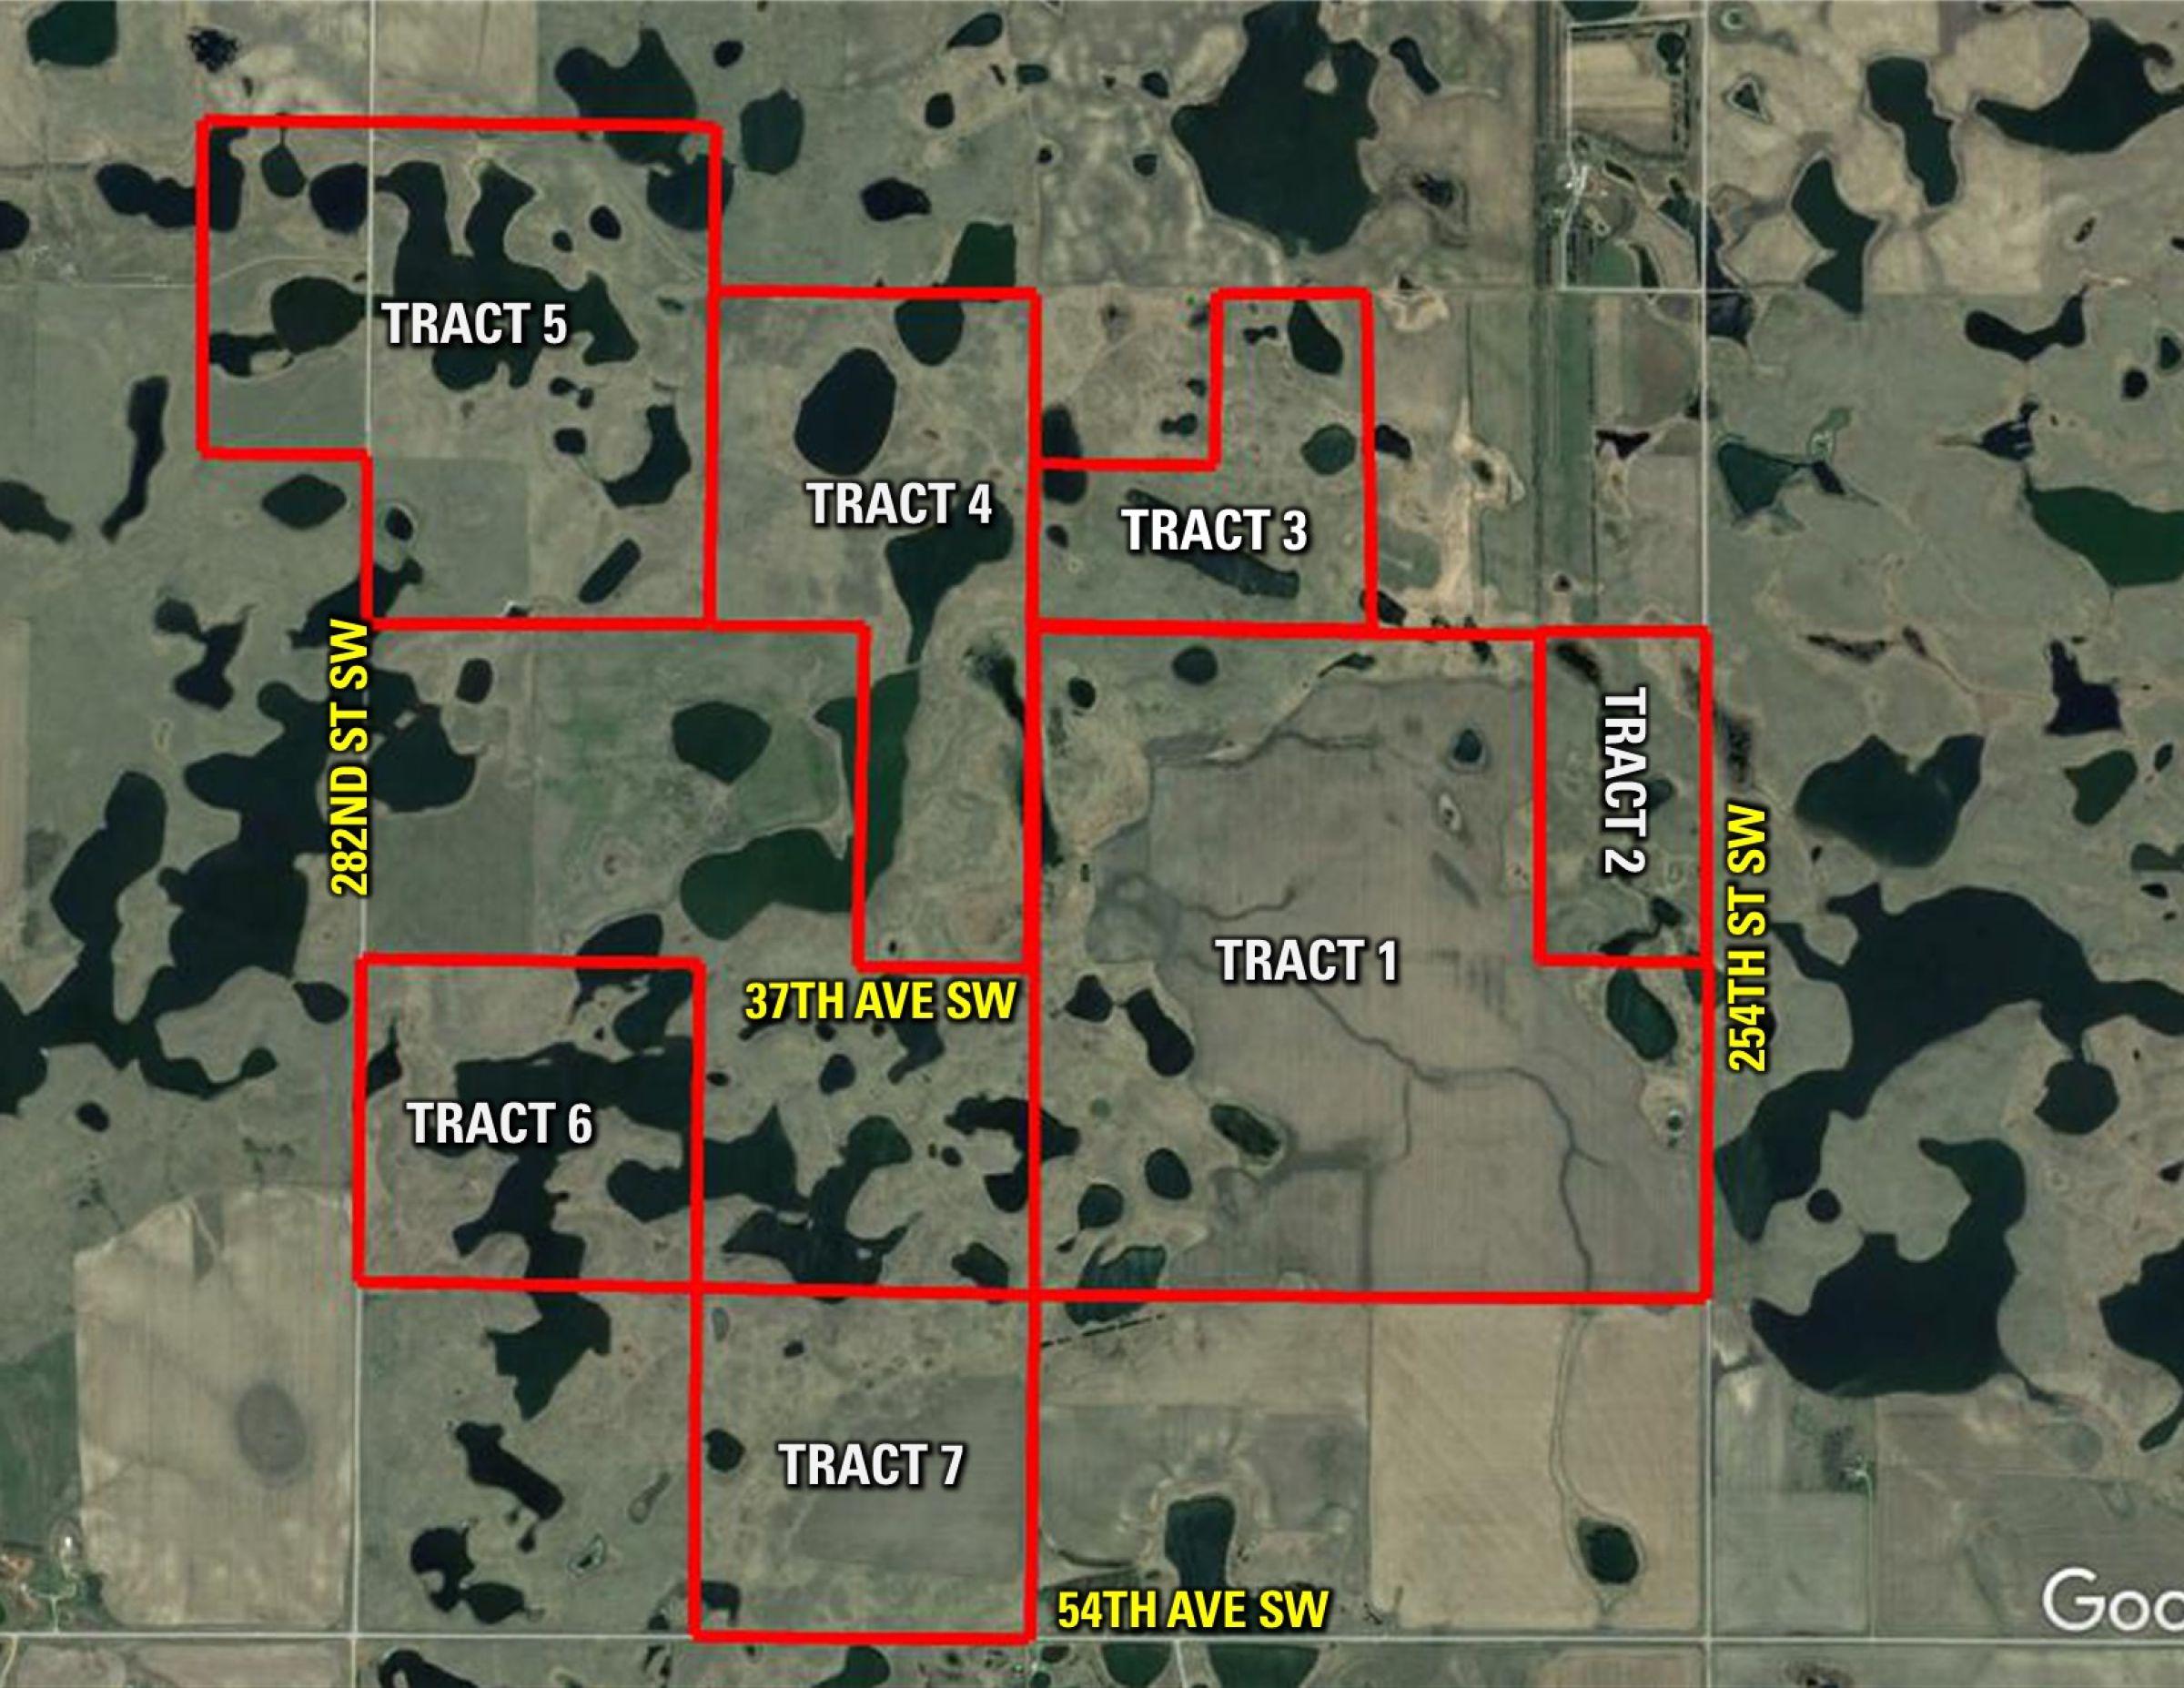 auctions-land-ward-county-north-dakota-1636-acres-listing-number-15736-0-2021-09-10-201017.jpg